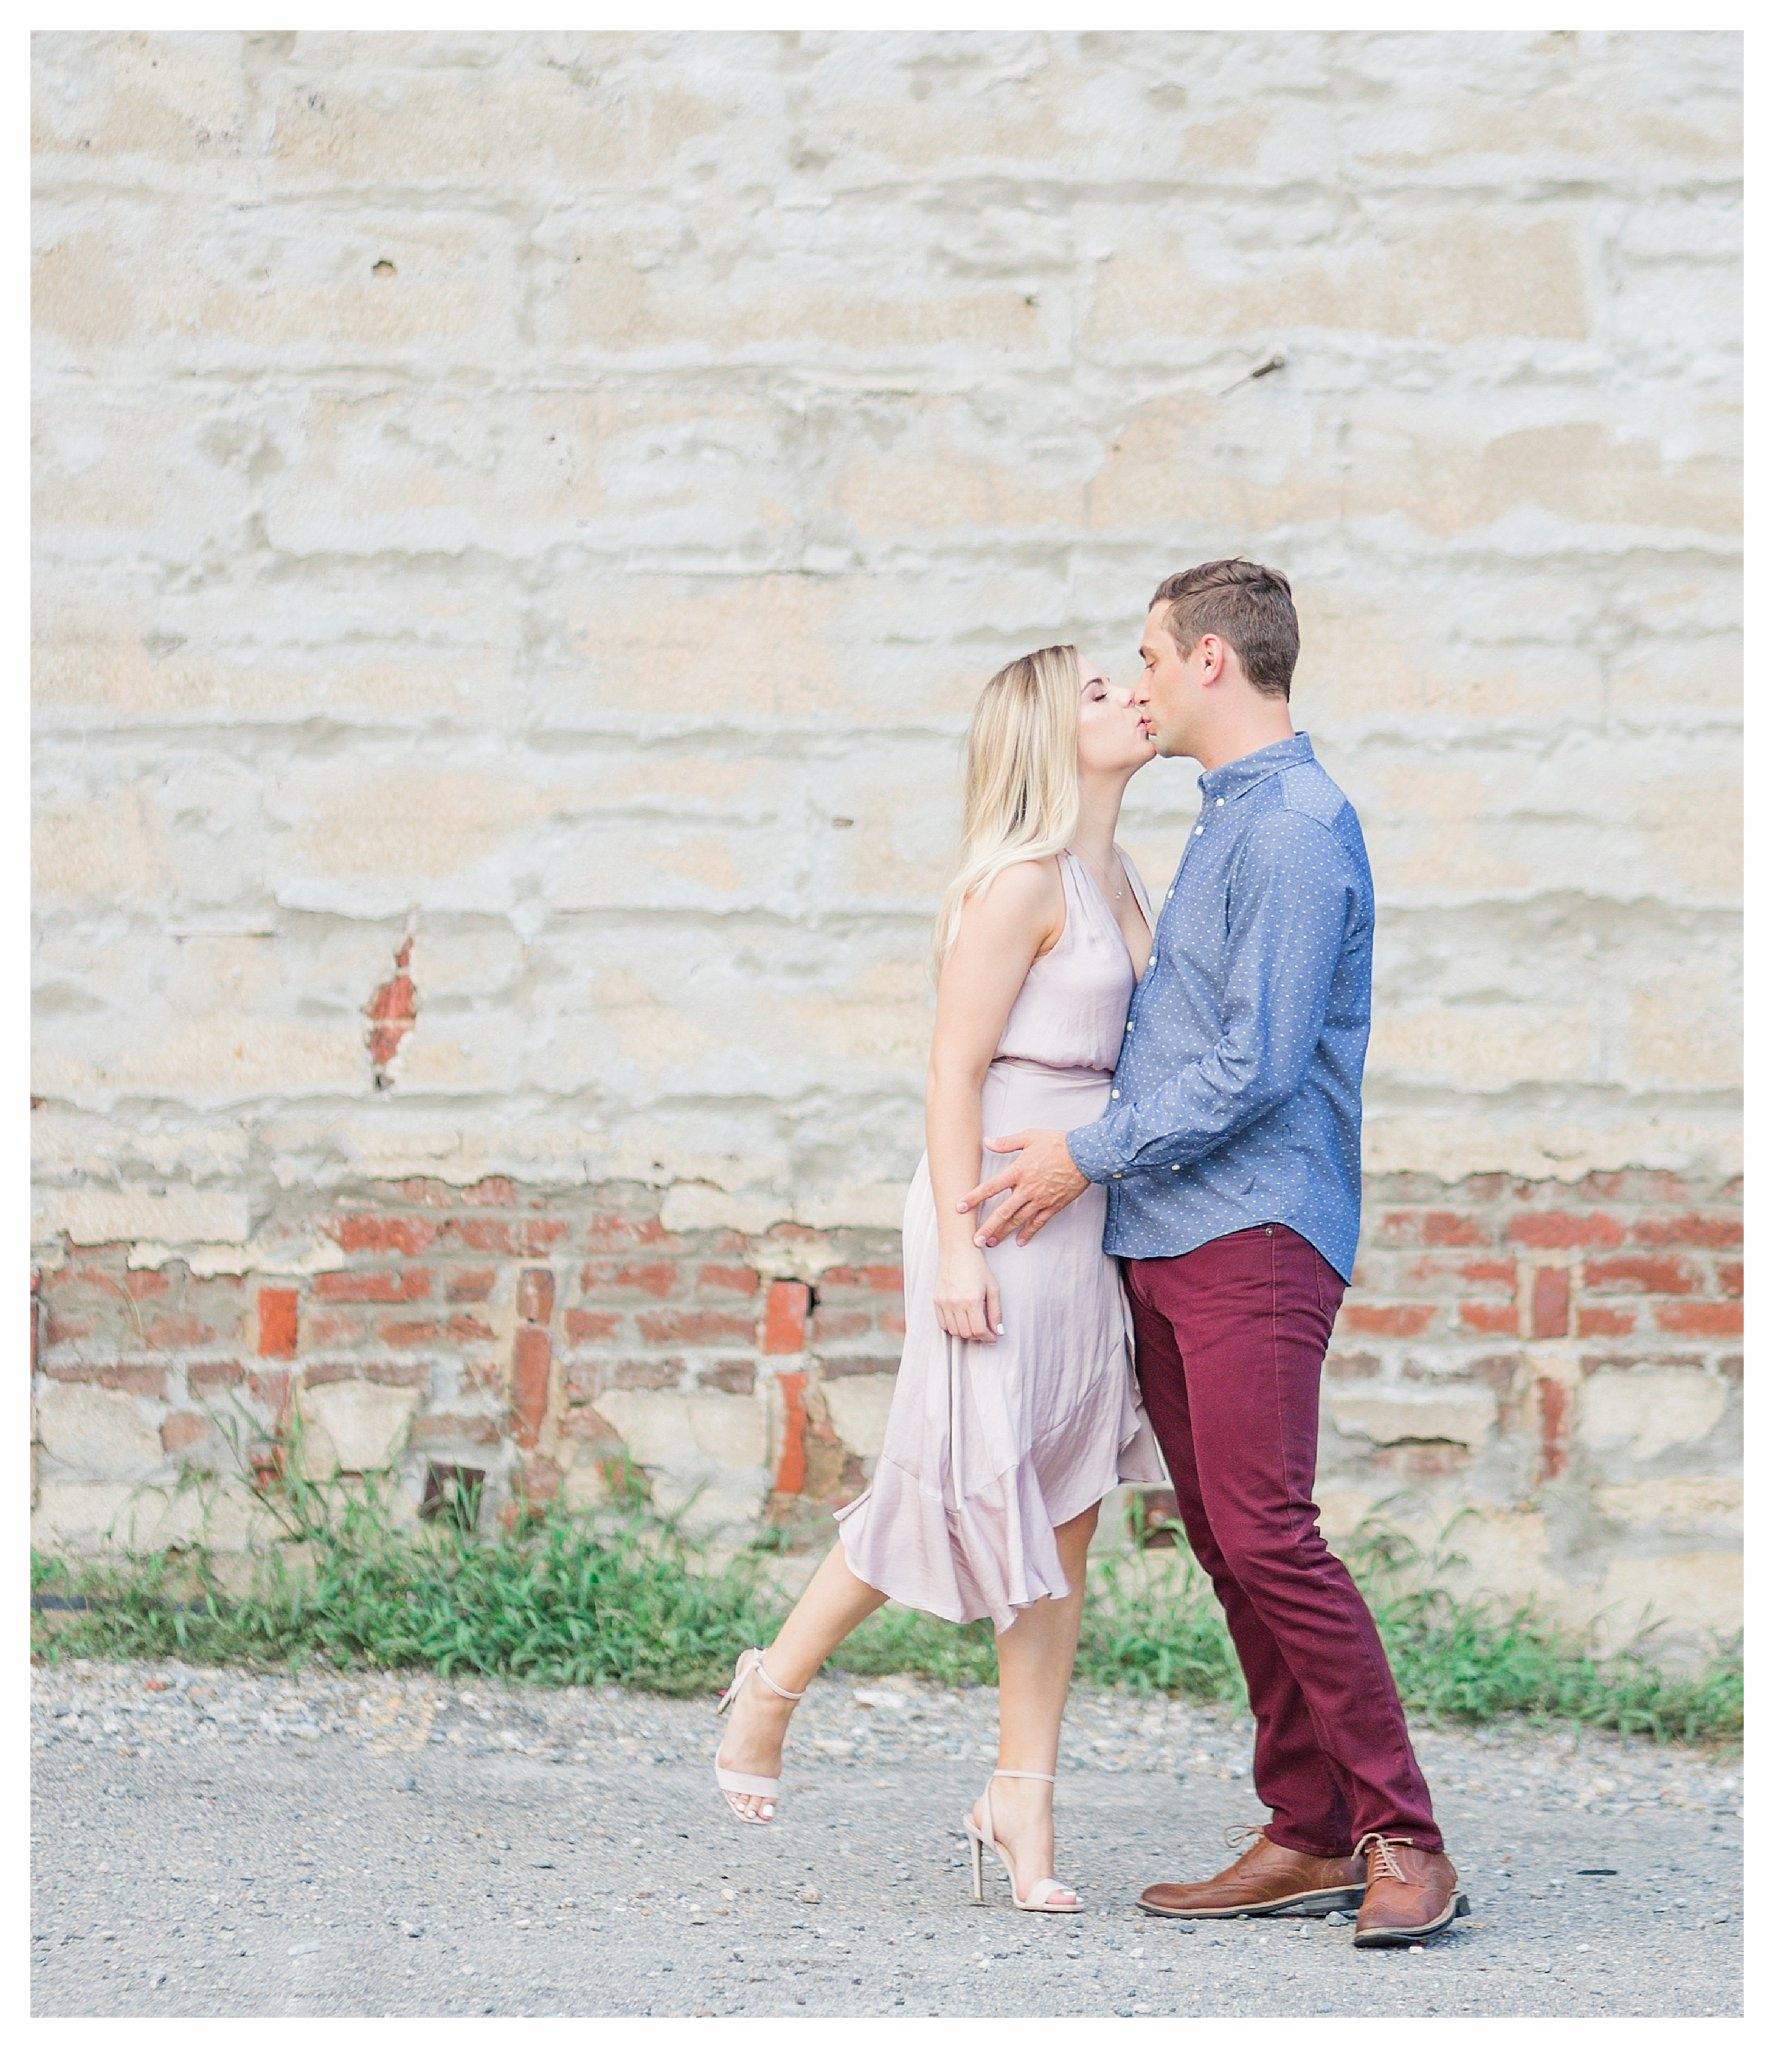 Richmond Engagement Photos - Main Street Station - Katie + Reid